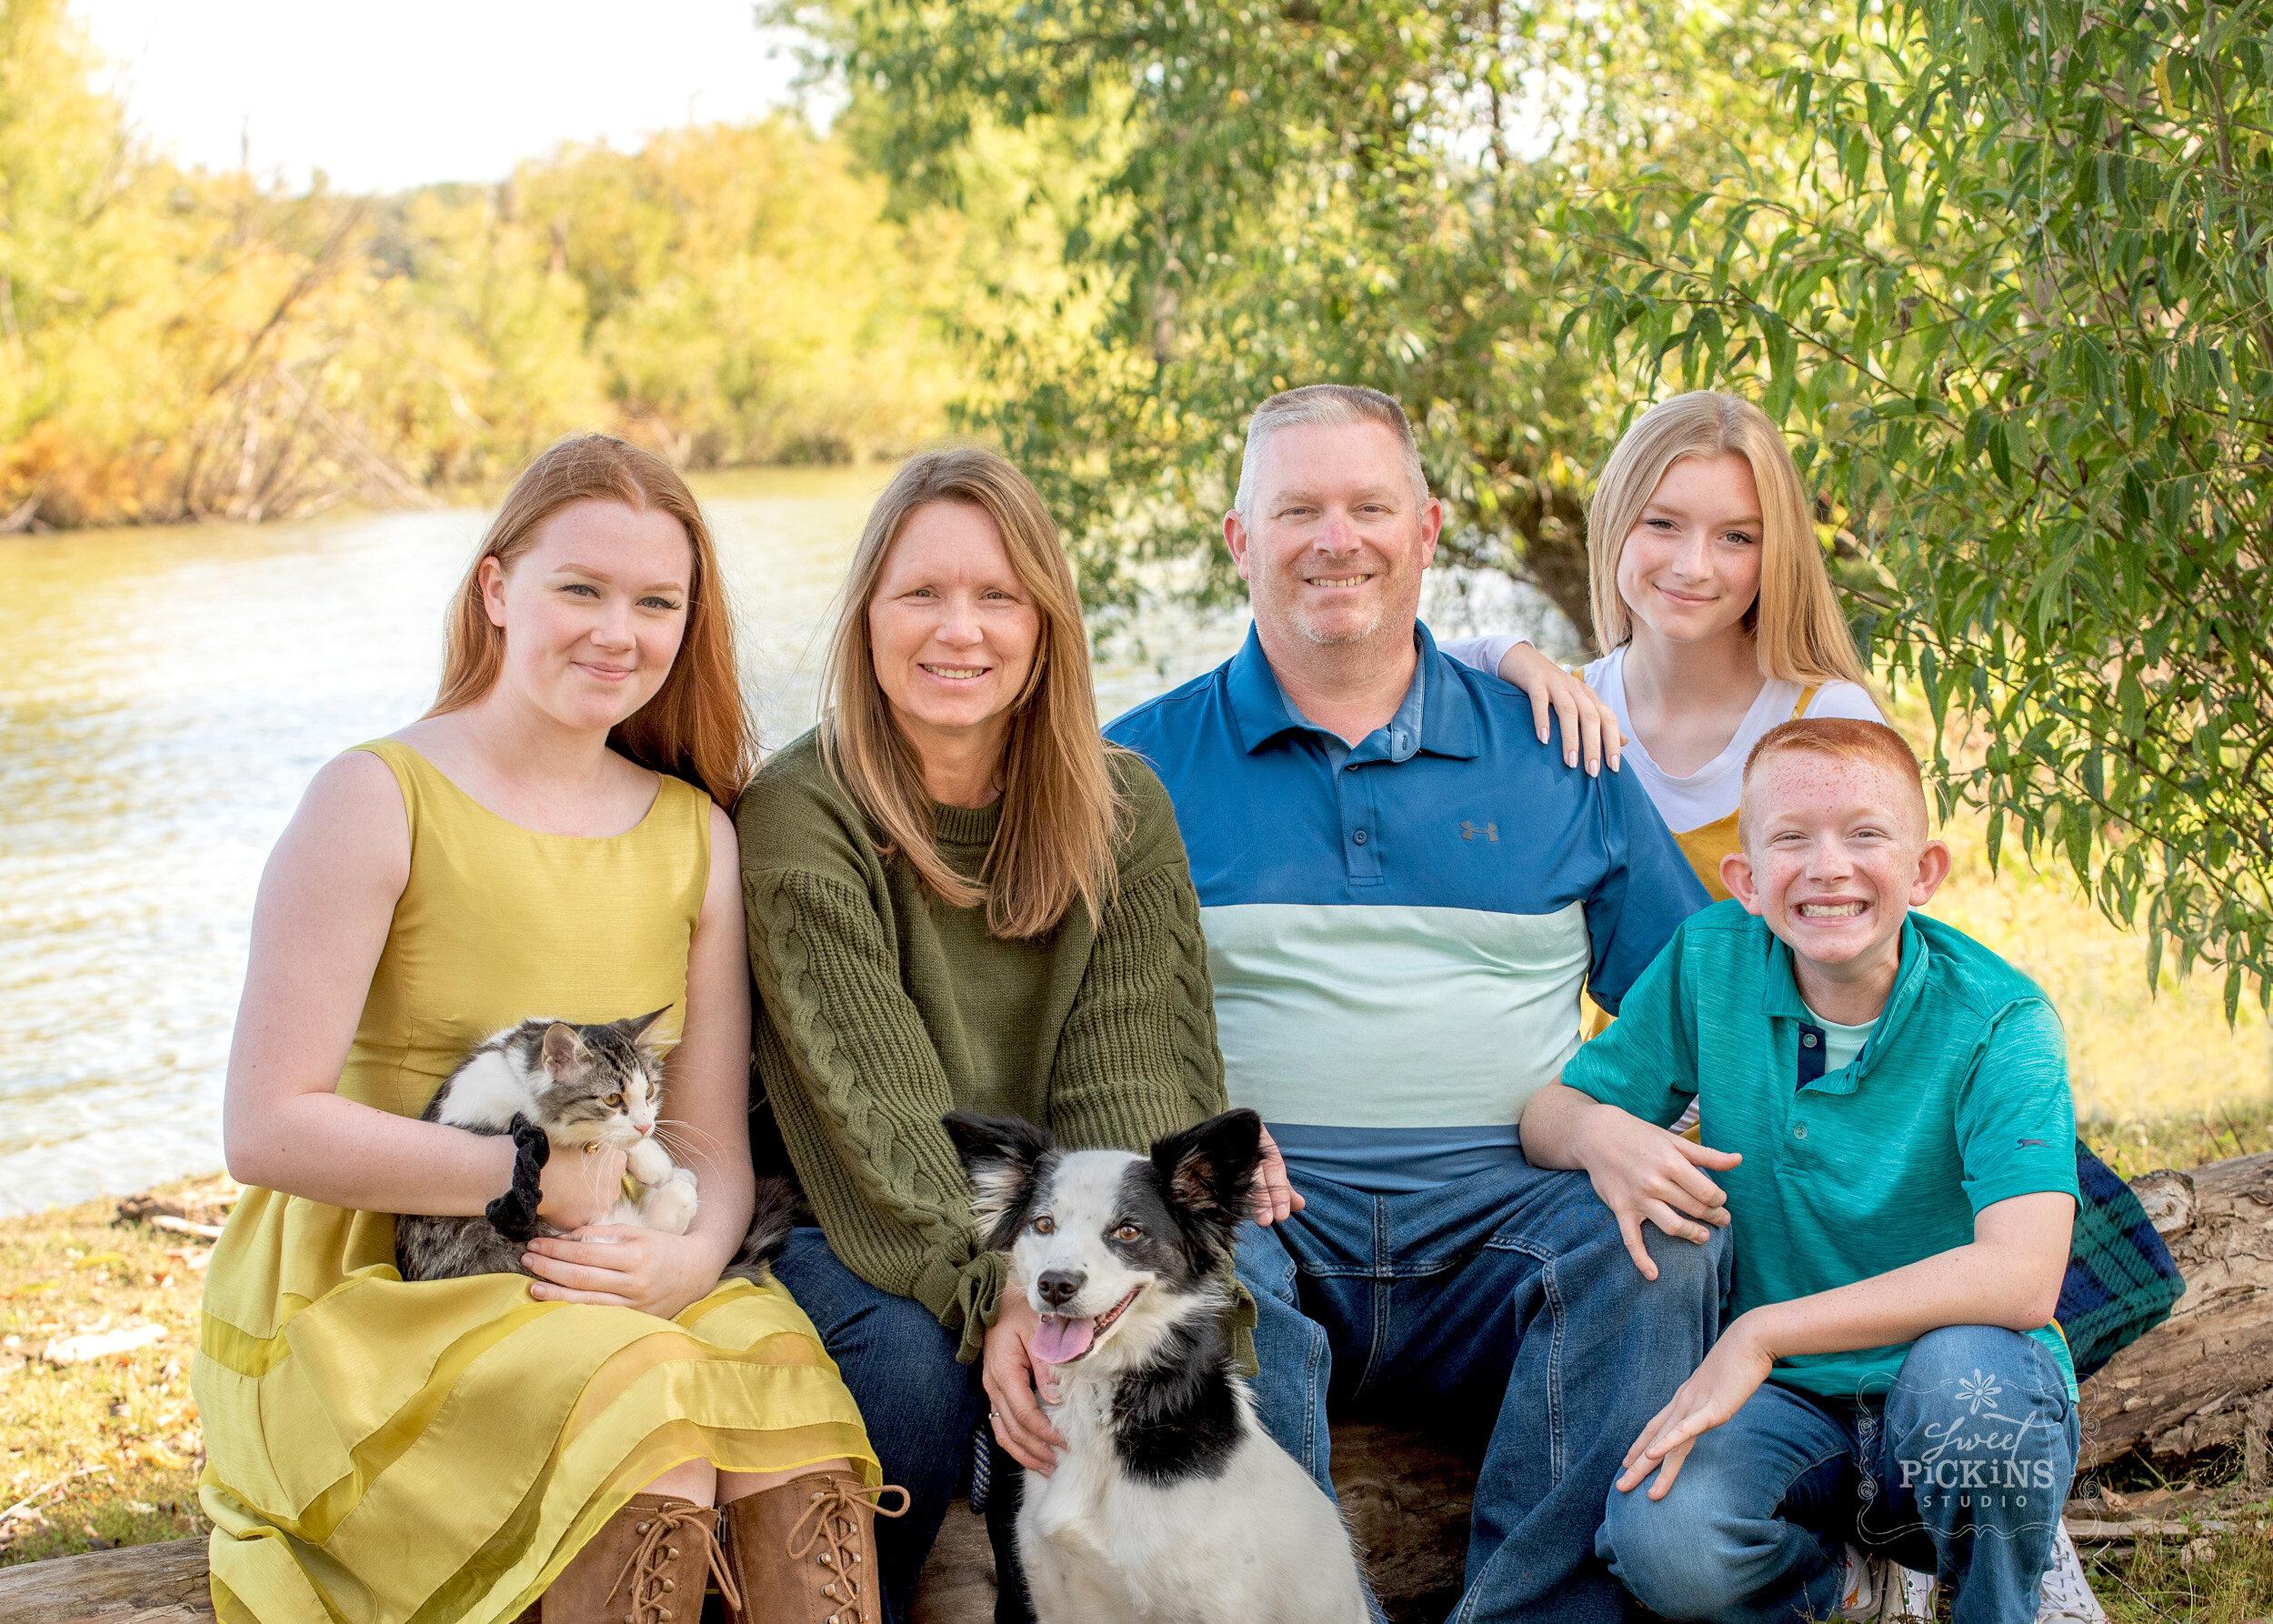 Sweet Pickins Studio Fall Family